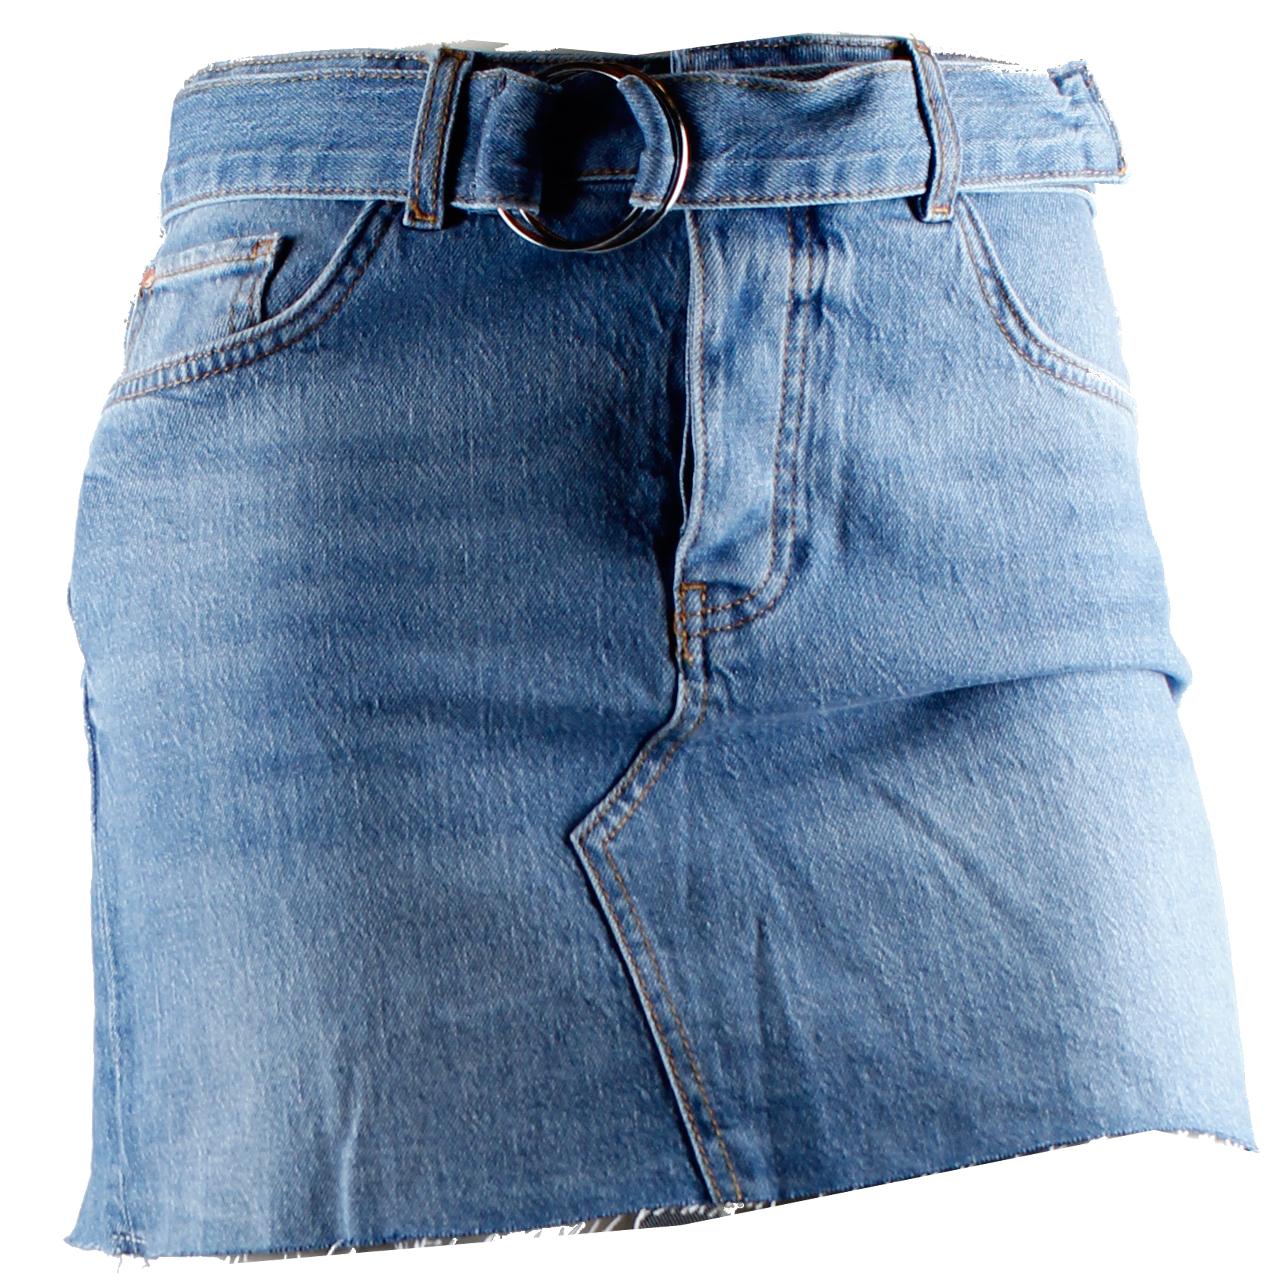 a743c2f80c4880 Guess W92D37 D3LD0 Jeans - Rokken - Dames - Irma Mode